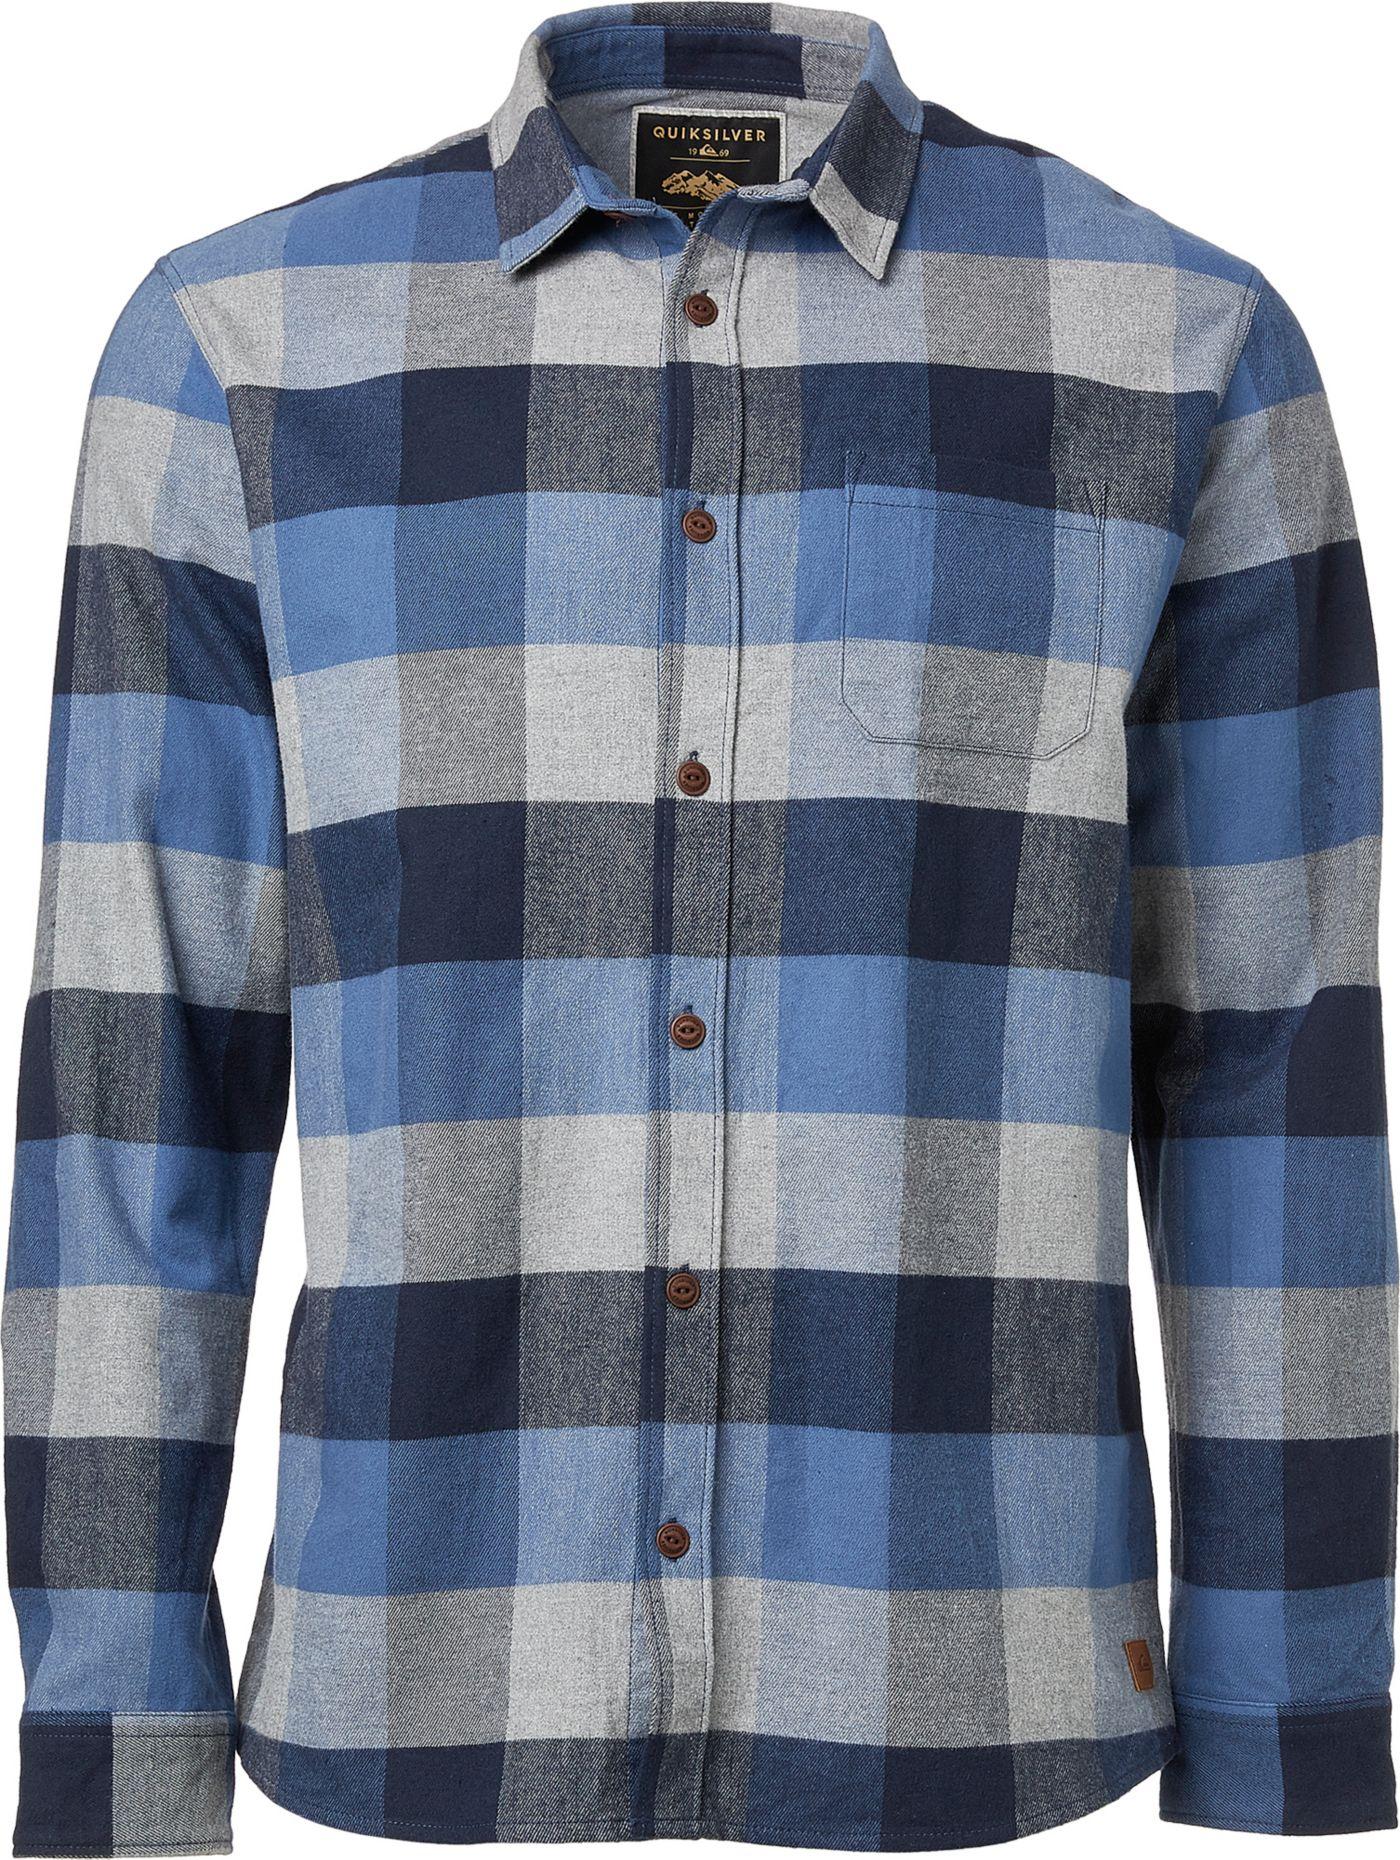 Quiksilver Men's Stretch Flannel Long Sleeve Shirt